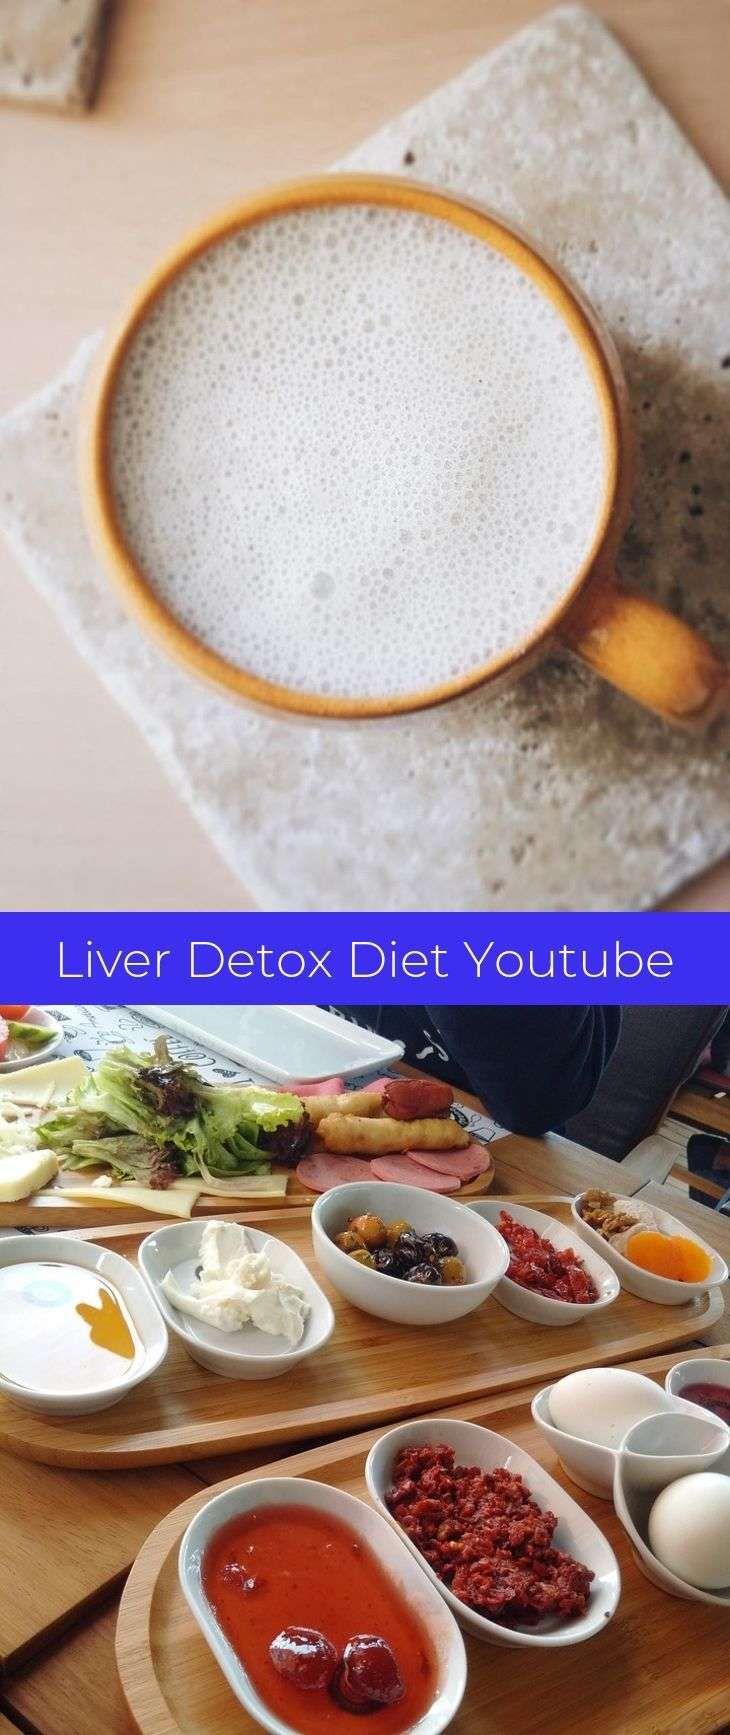 Best Homemade Detox Cleanse For Weight Loss   Detox Diet Grocery List   Pinterest   Detox, Diet and Detox tea diet